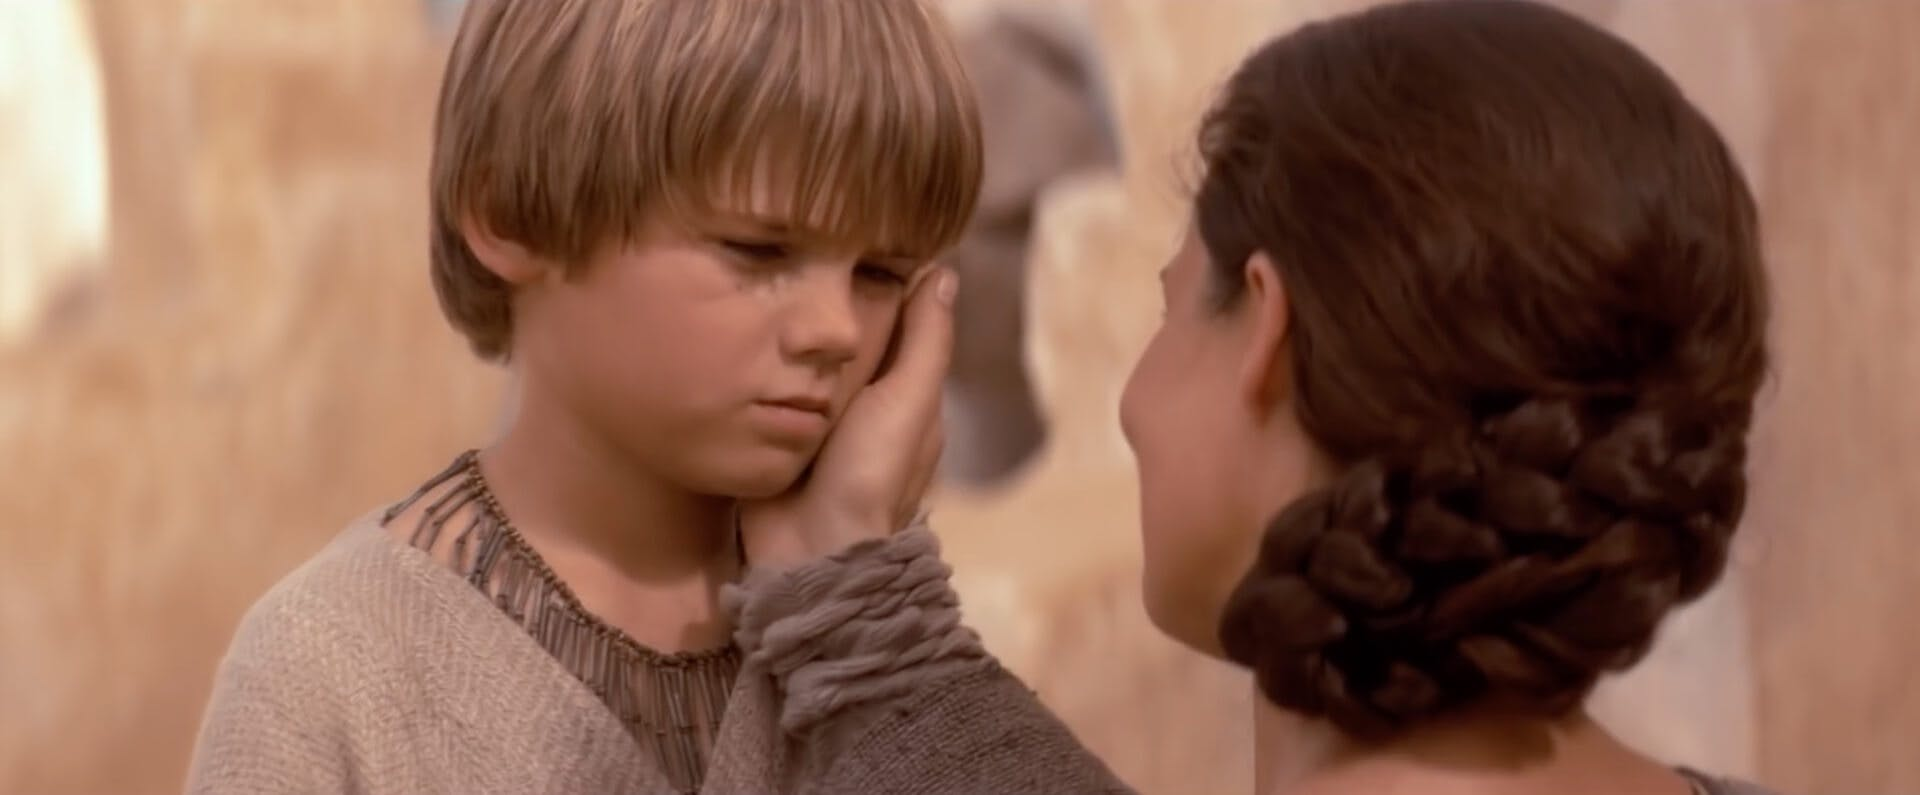 Phantom Menace - Anakin Skywalker star wars movies